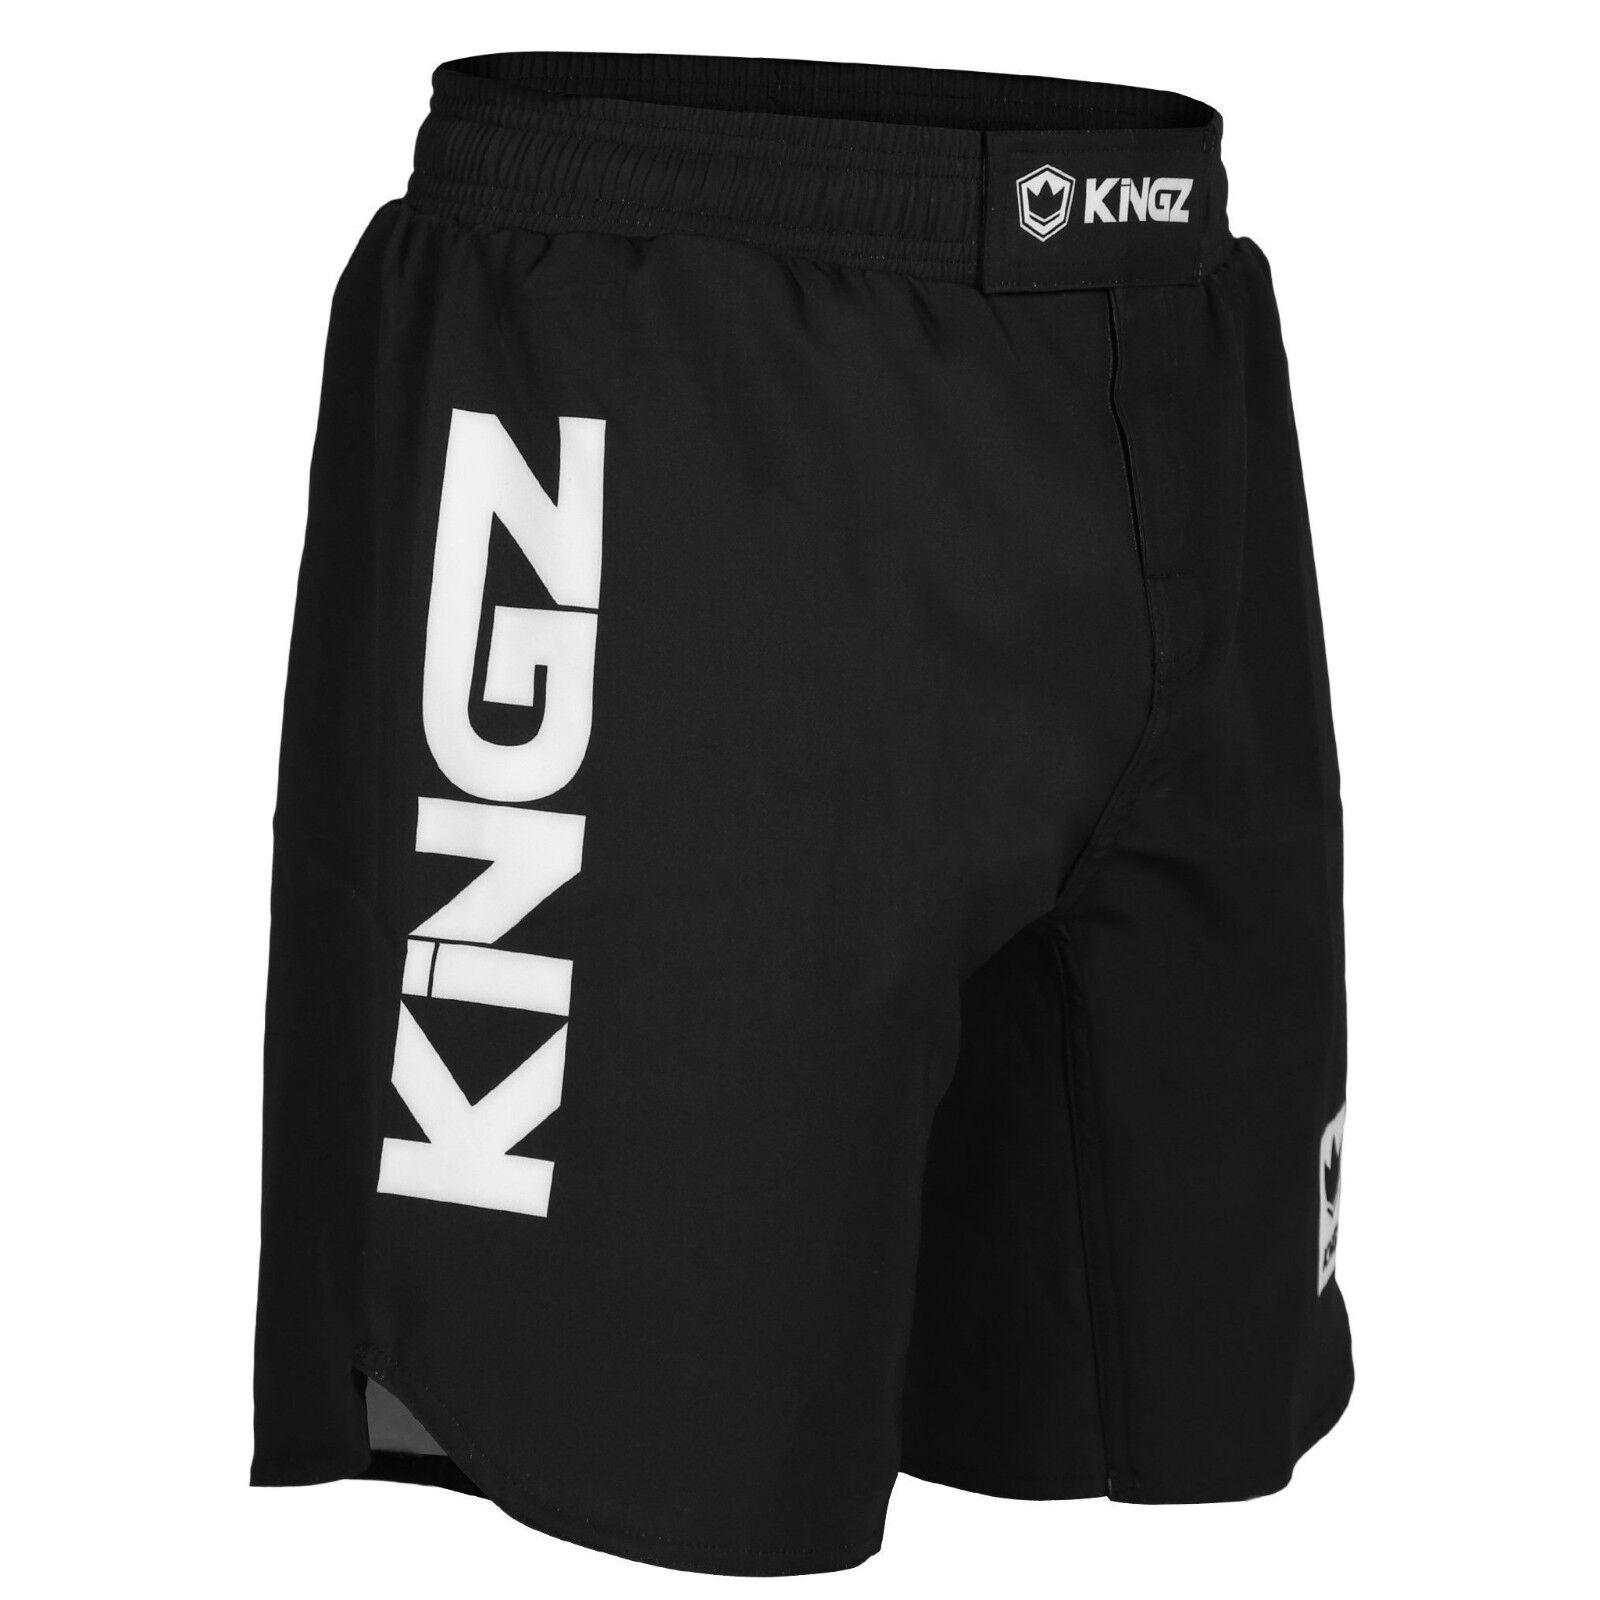 Kingz Crown Competition Shorts Black black No-Gi BJJ Jiu Jitsu IBBJF Approved